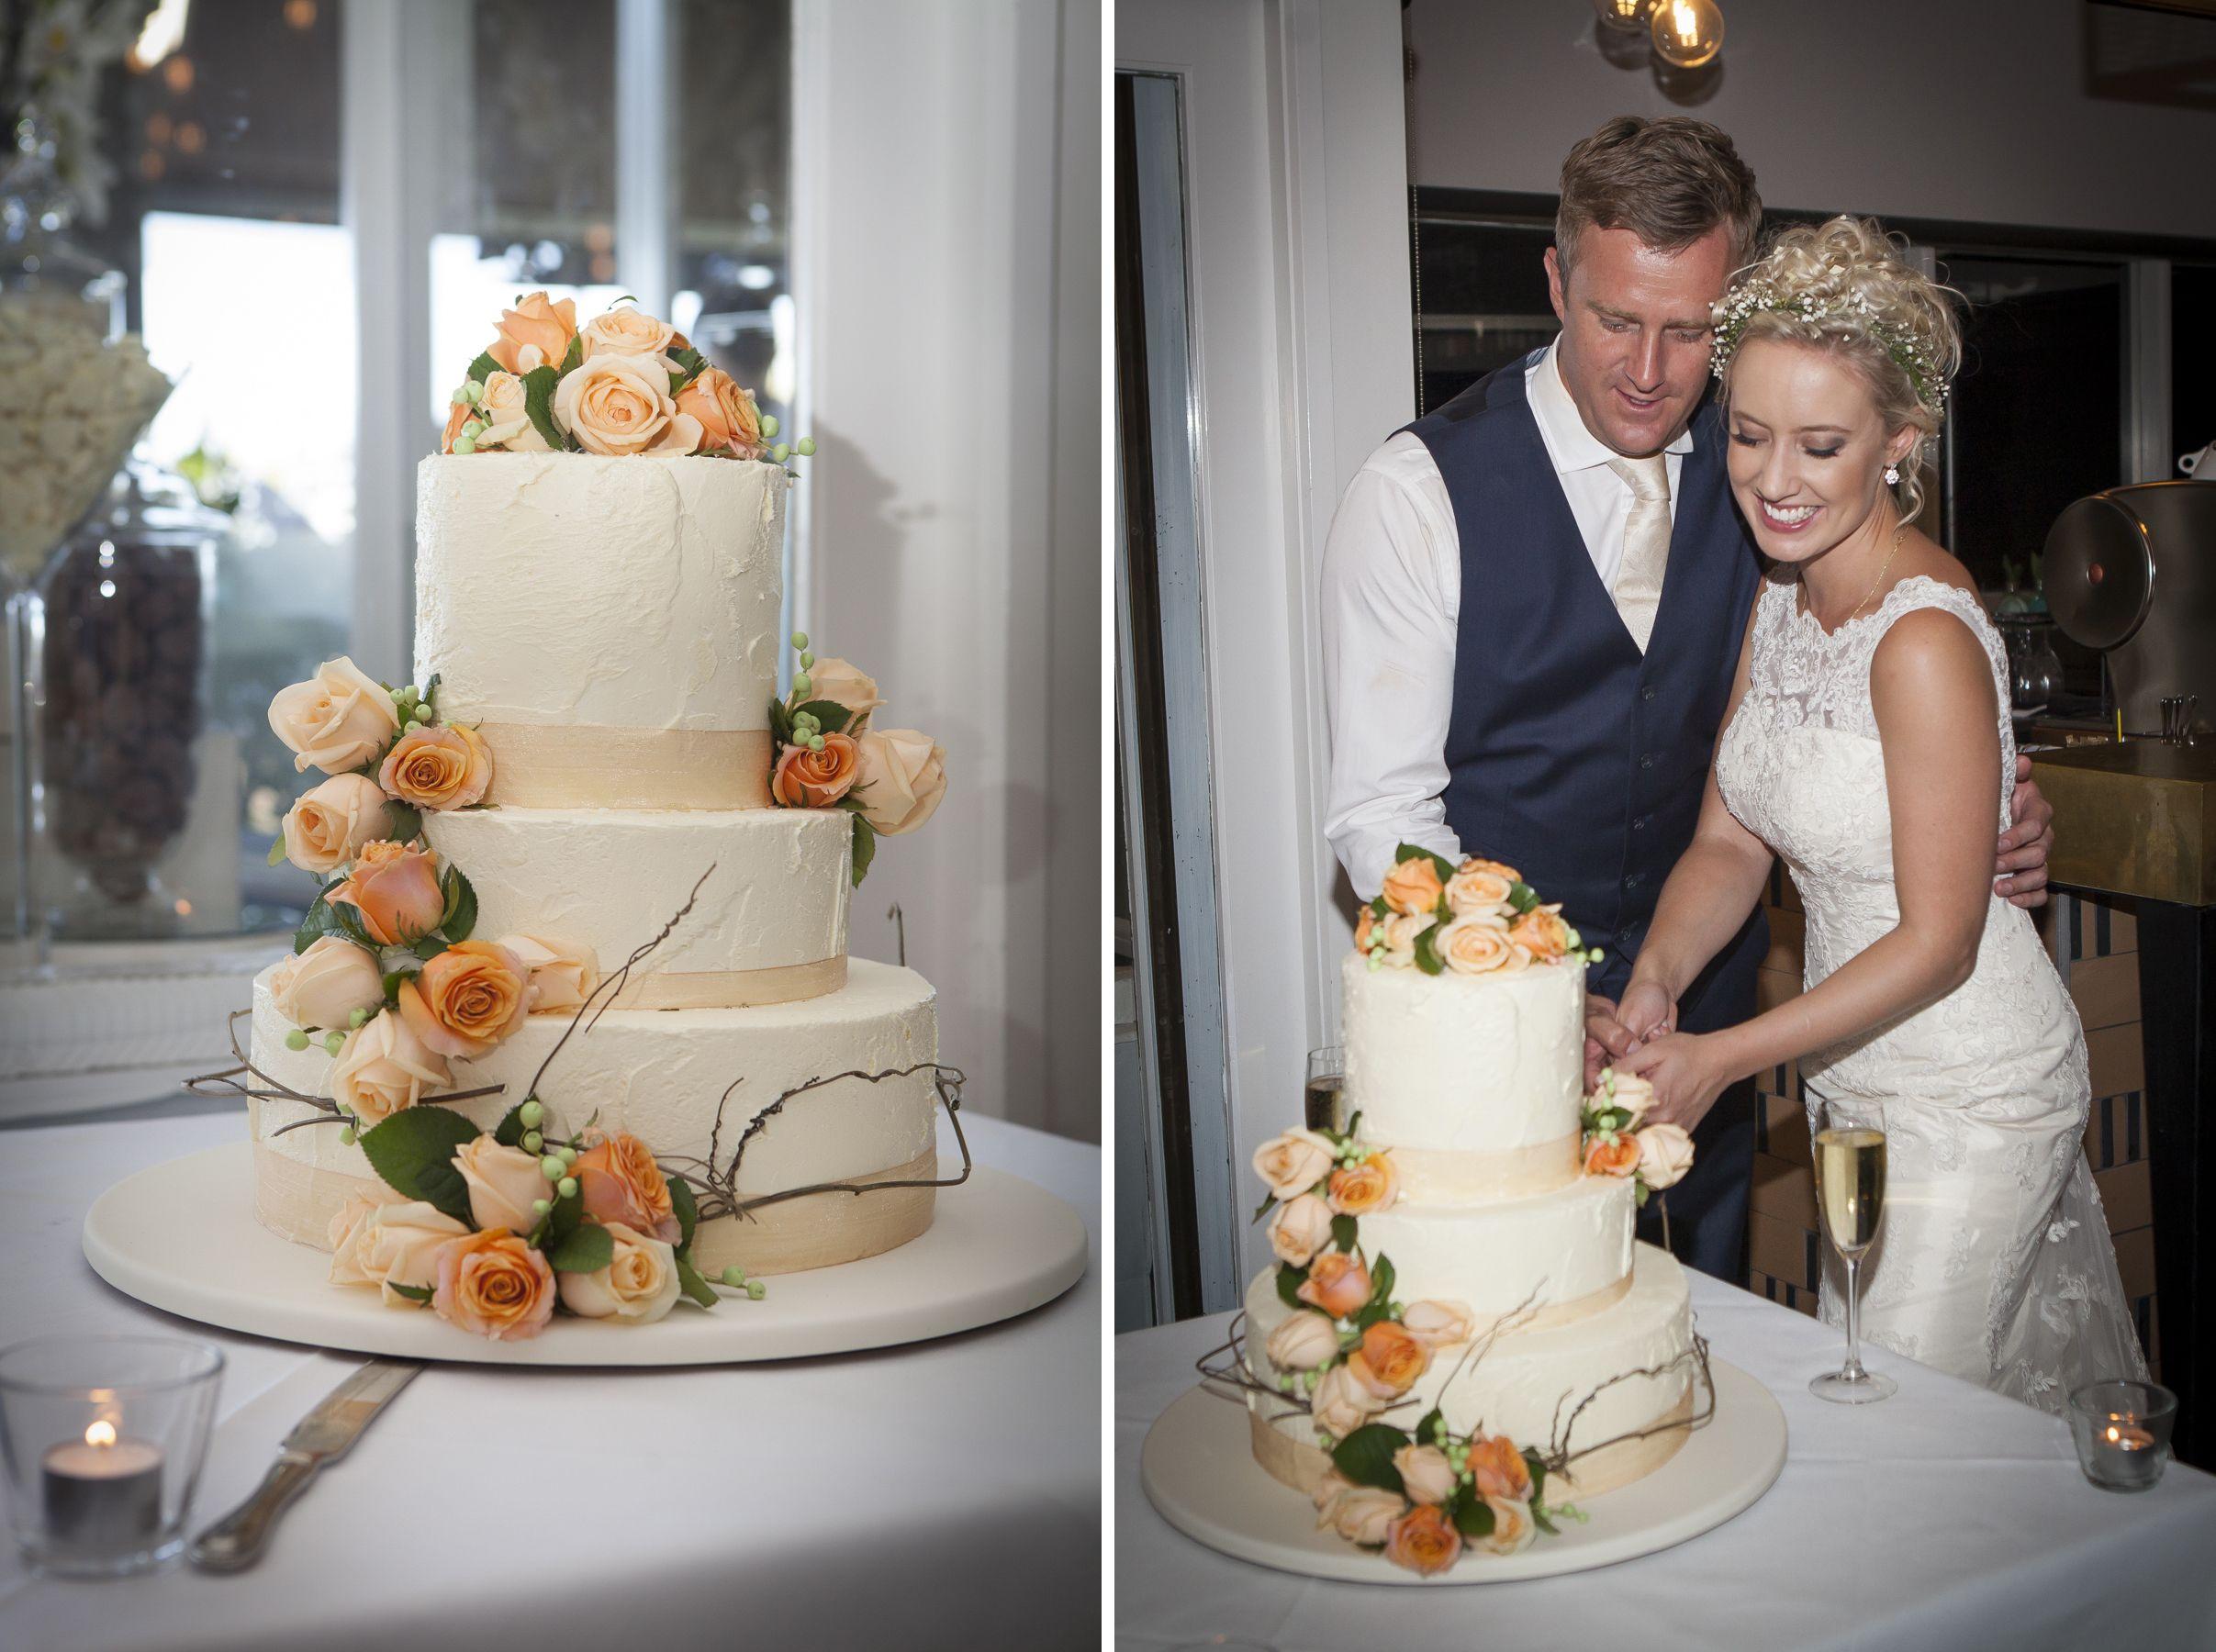 Alex And Ryans Three Tier Wedding Cake Decorated With Fresh Flowers Dodda